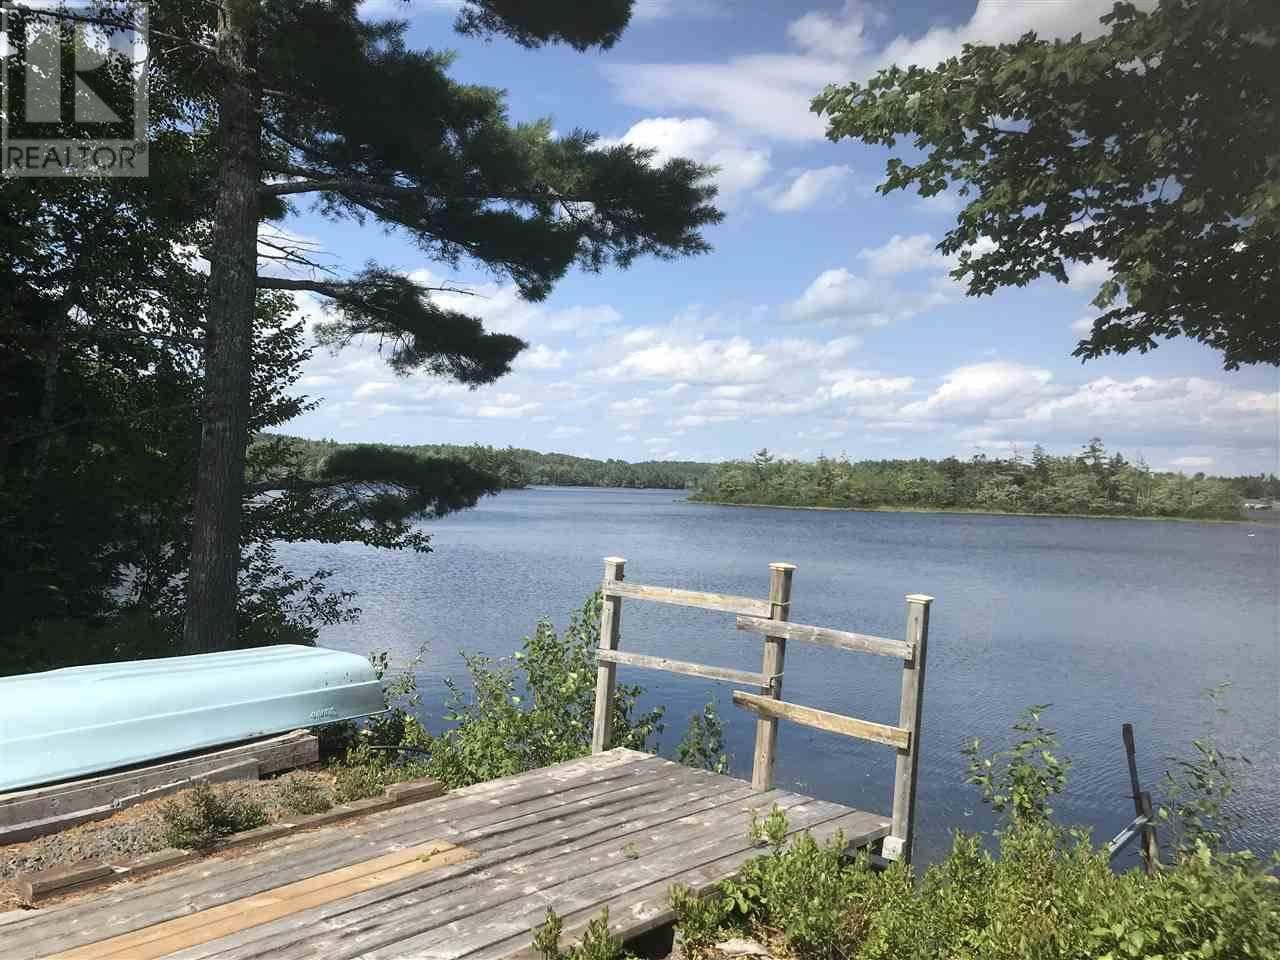 Residential property for sale at 818 Camperdown School Rd Camperdown Nova Scotia - MLS: 201919691